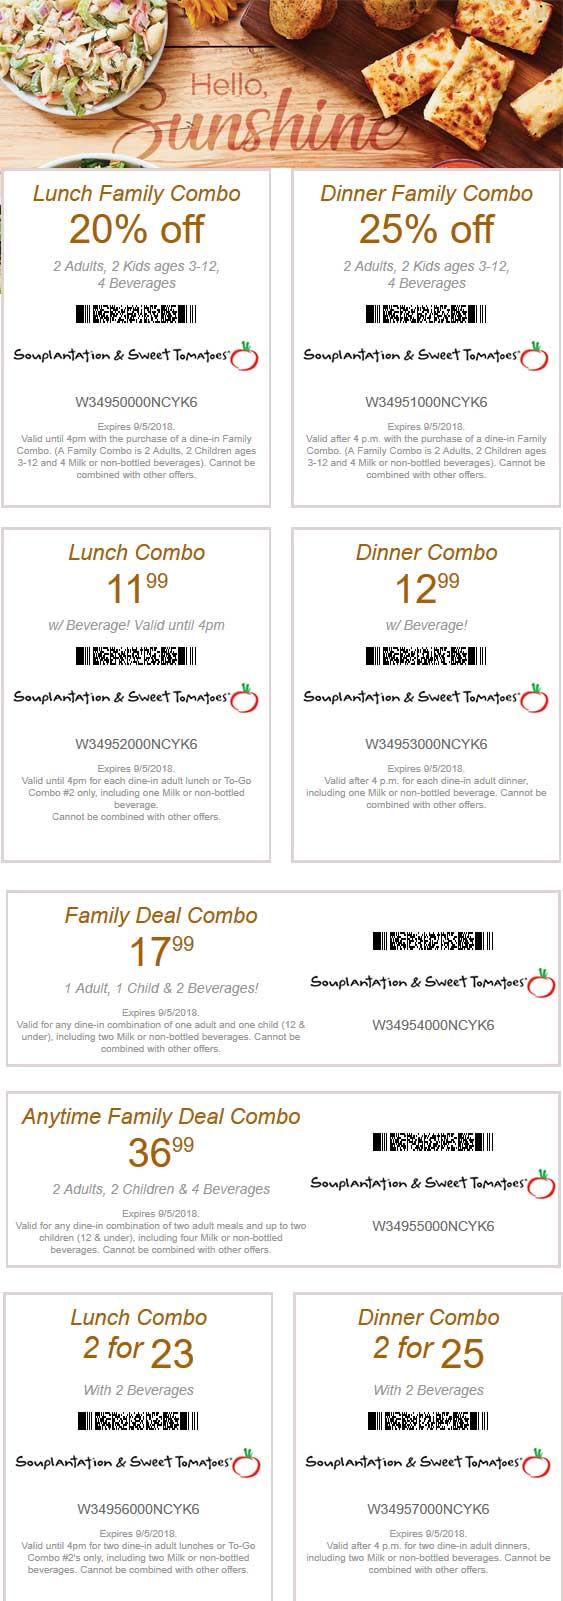 Sweet Tomatoes Coupon November 2019 20-25% off & more at Souplantation & Sweet Tomatoes restaurants